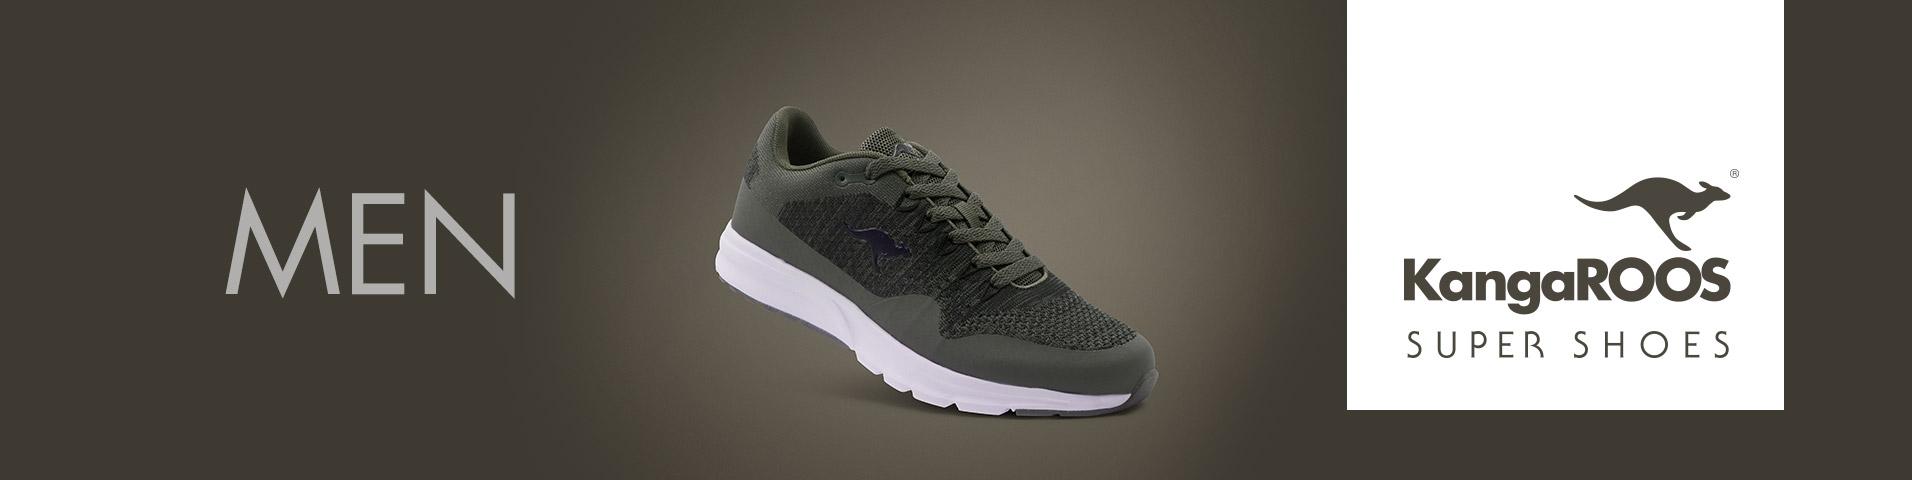 KangaROOS Schuhe für Herren | ZALANDO